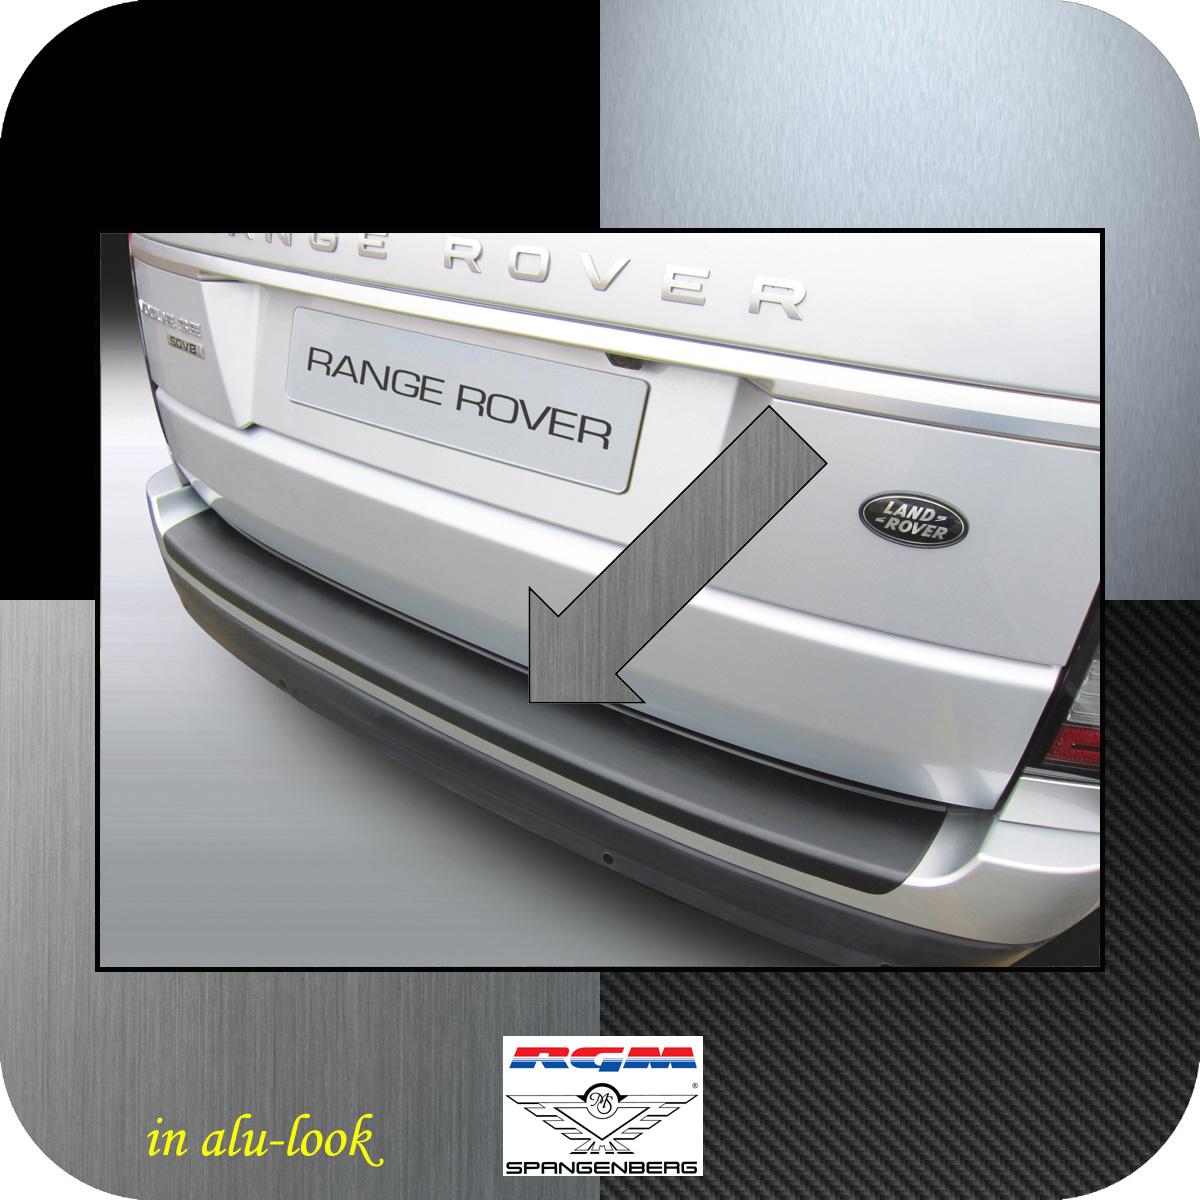 Ladekantenschutz Alu-Look Land Rover Range Rover IV Vogue ab 2012- 3504892